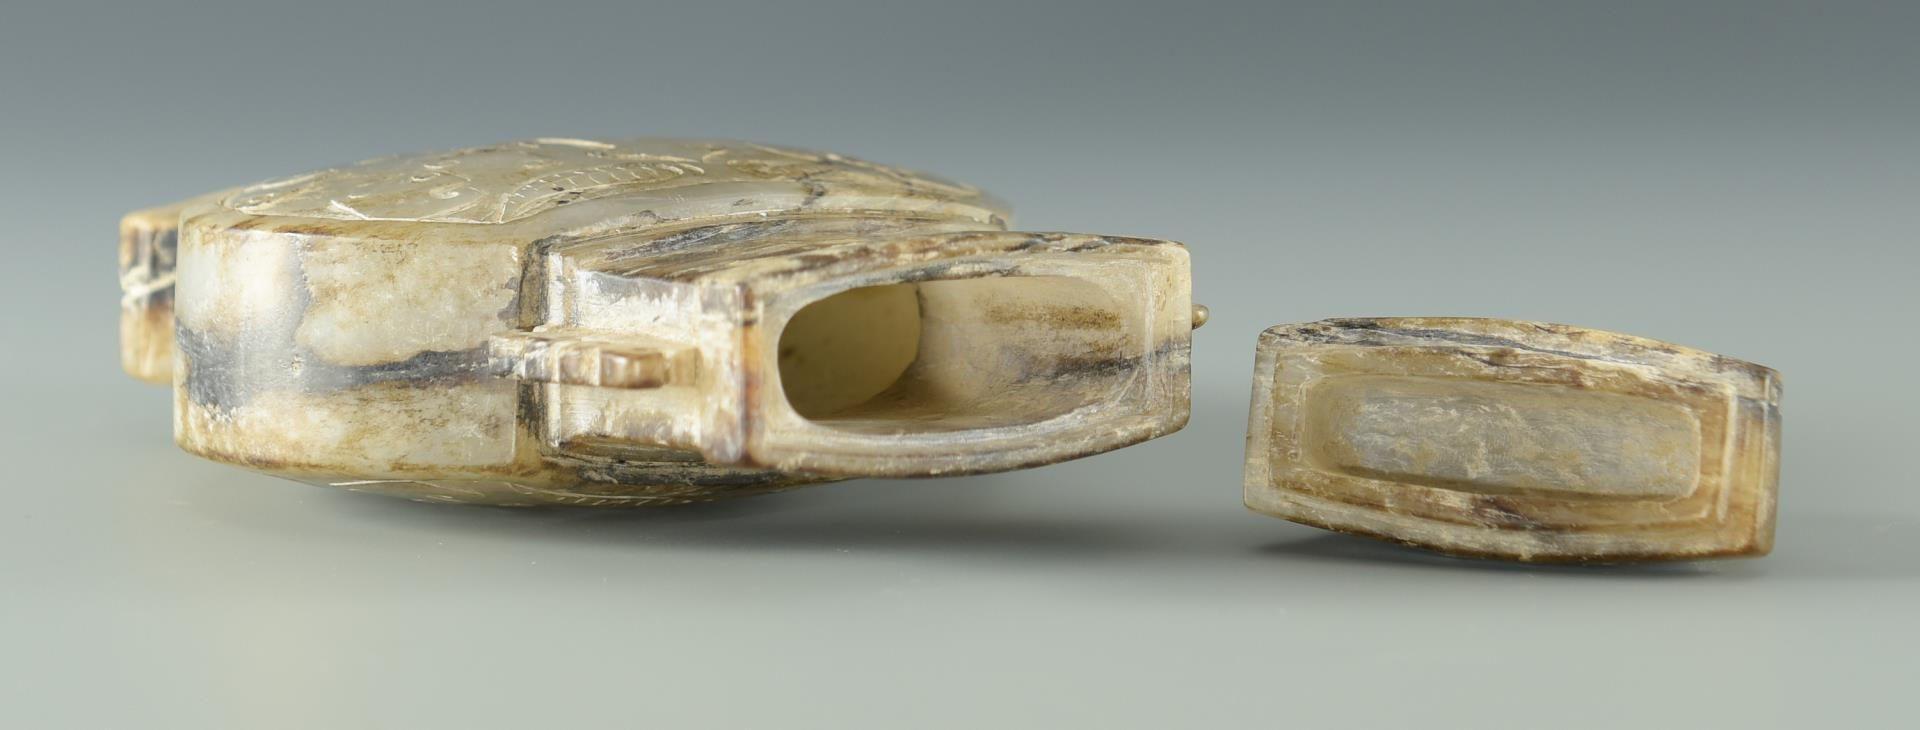 Lot 34: Chinese Archaistic Hardstone Vase